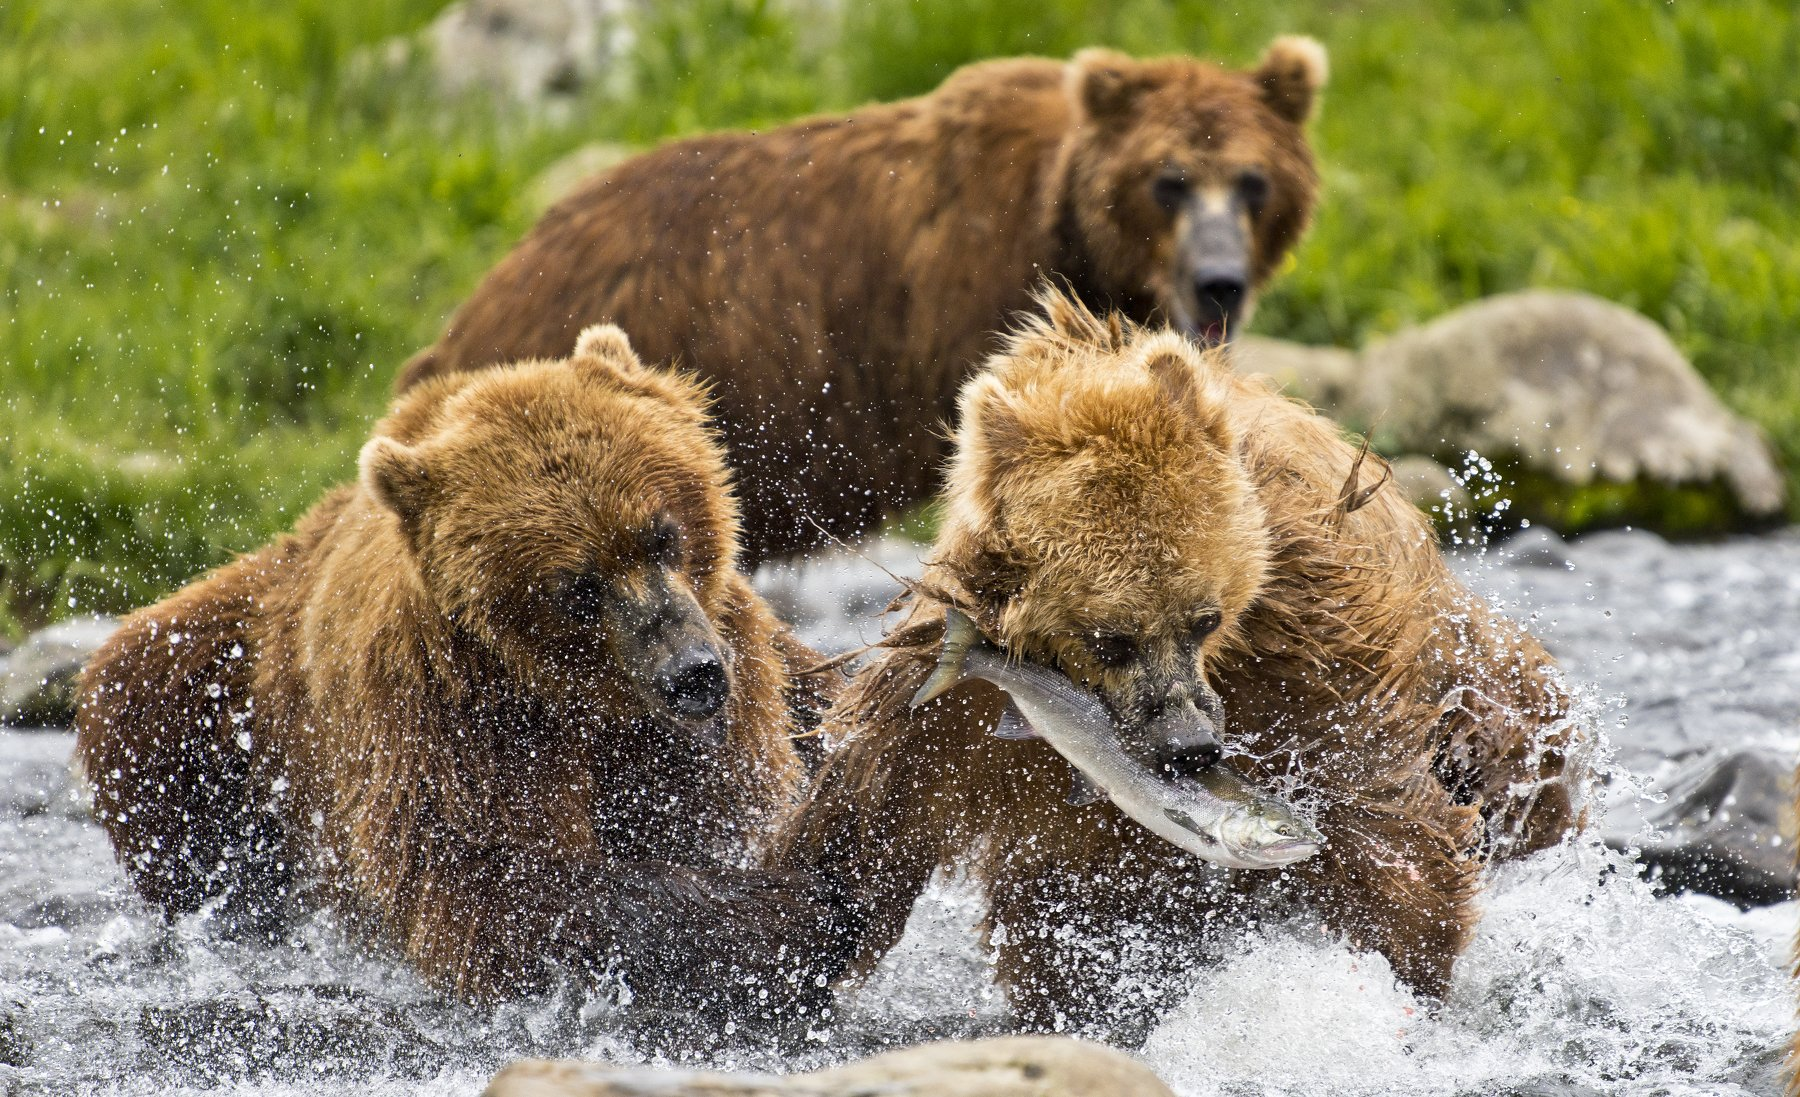 Bear Animal Mammal Salmon Russia Kamchatka fishing, Barbarini Paolo